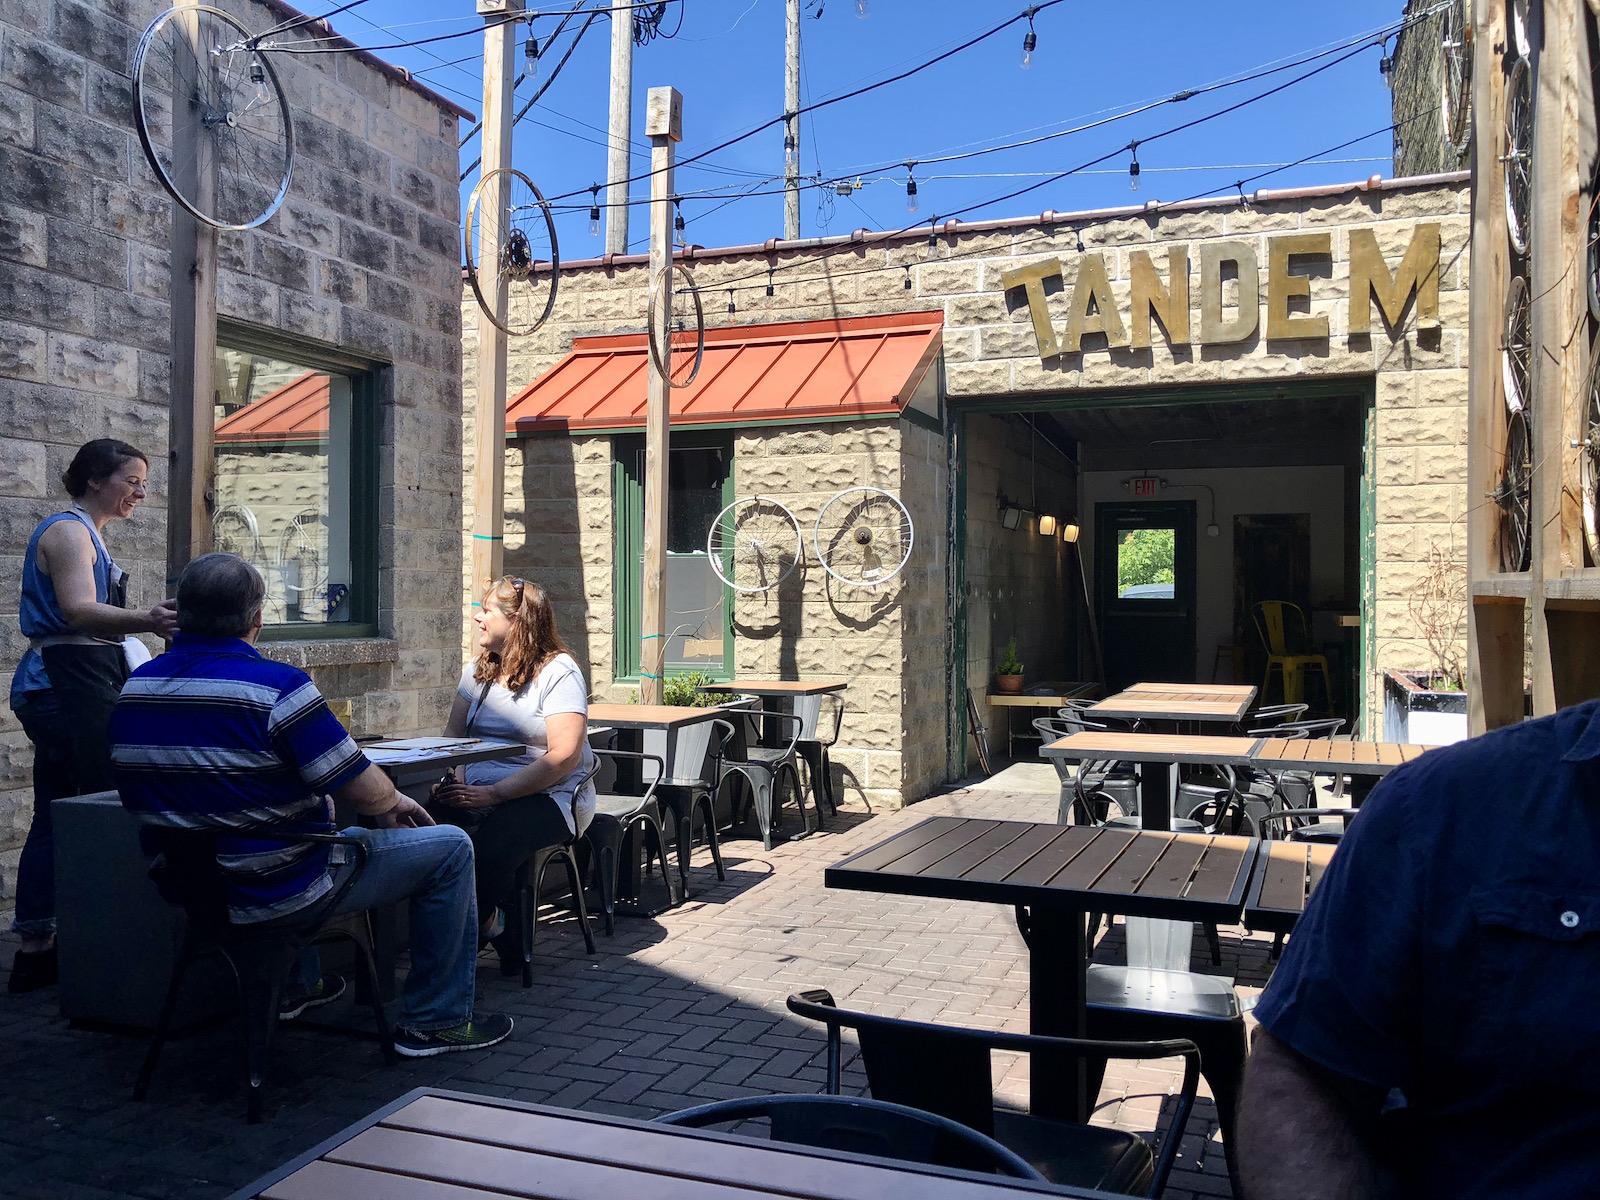 The Tandem patio